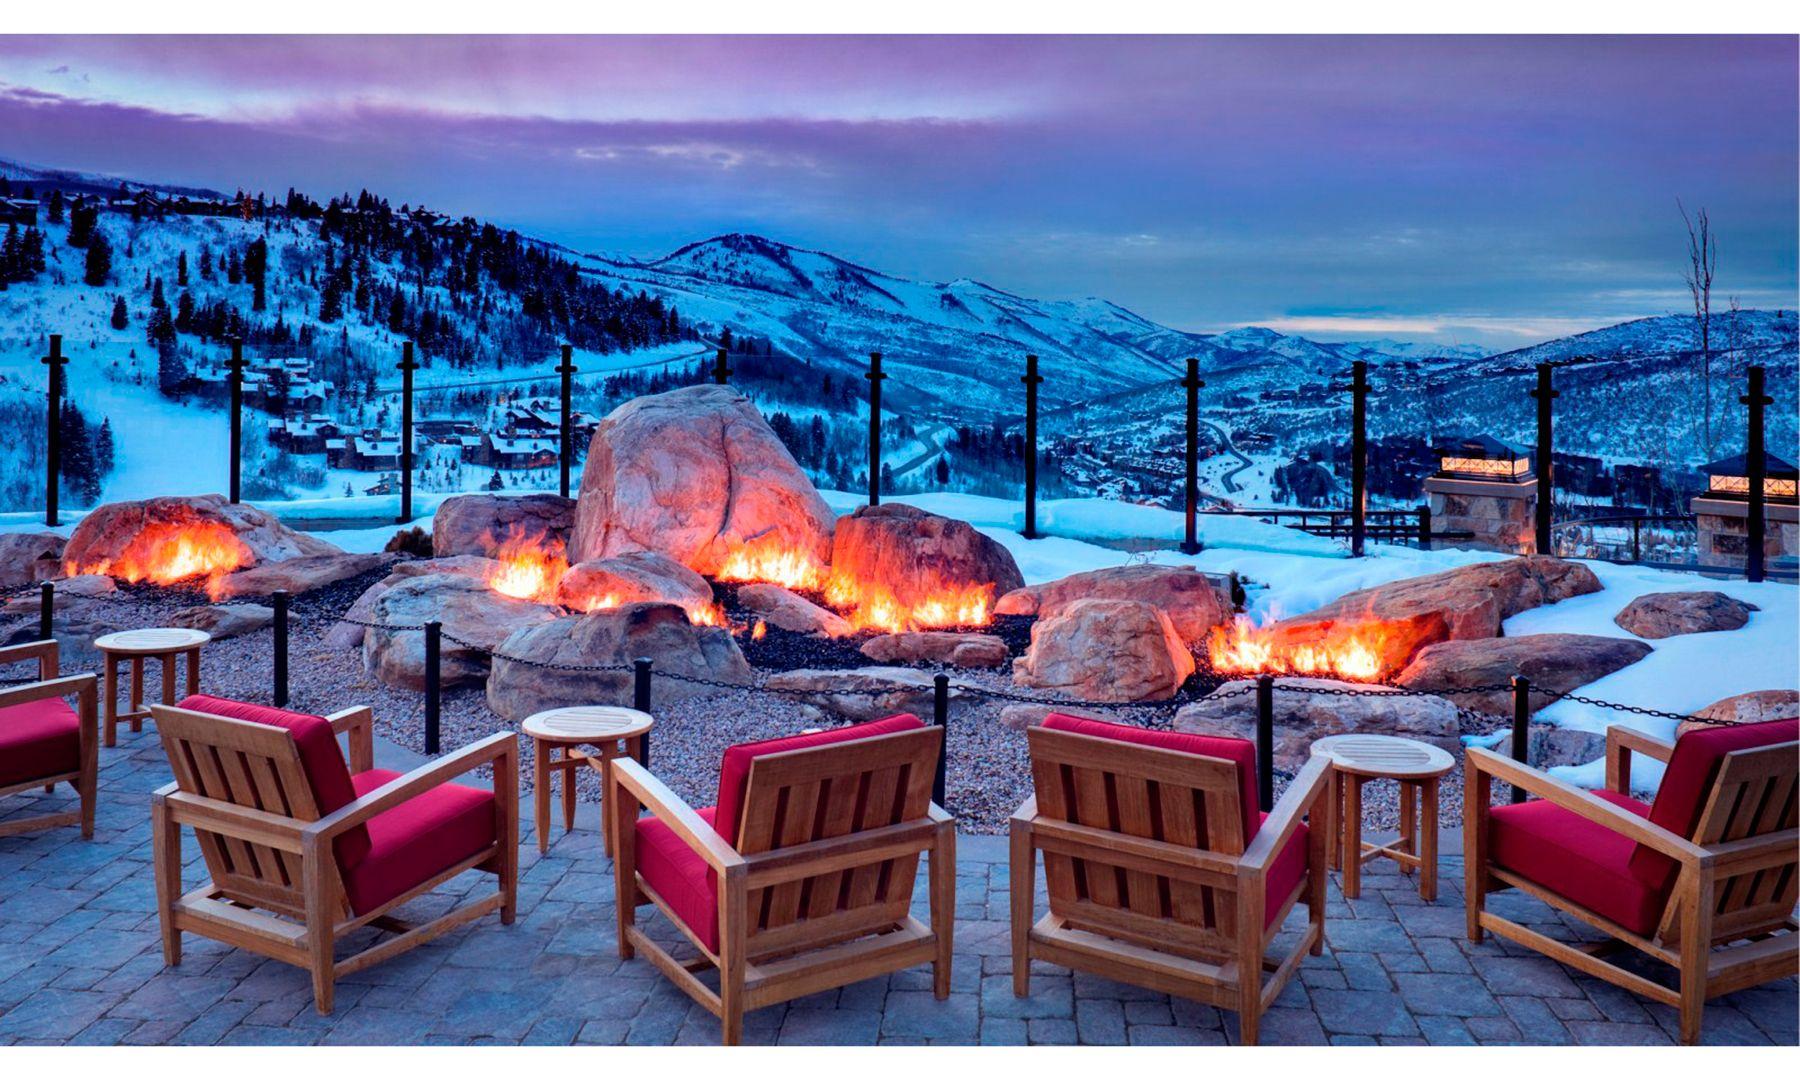 Best FamilyFriendly Ski Resorts Deer valley resort